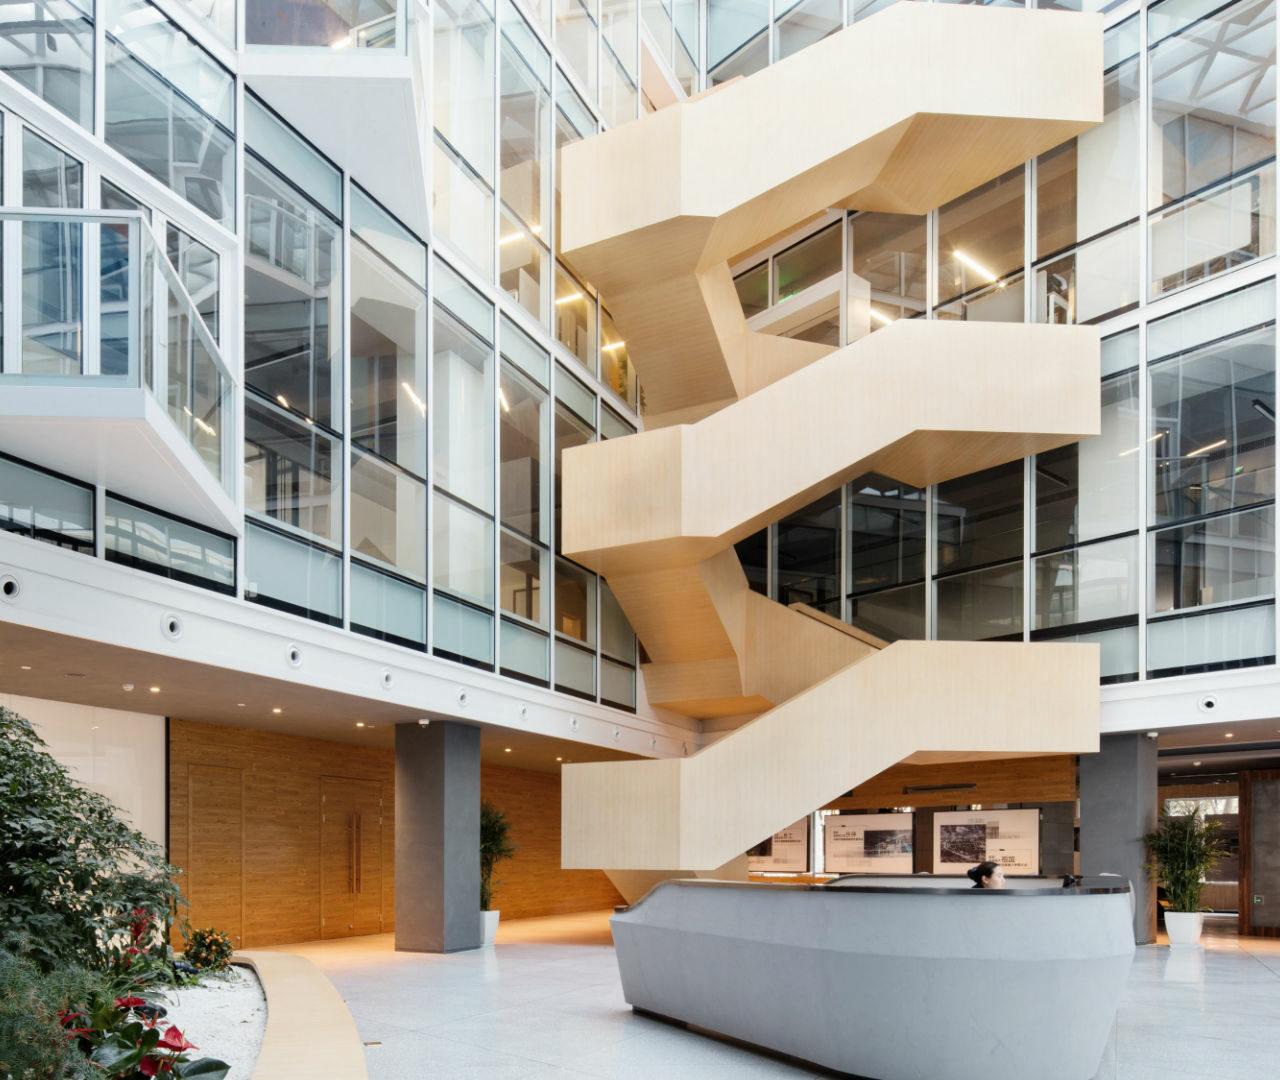 WGBC report: UK facing workplace wellness investment shortfall